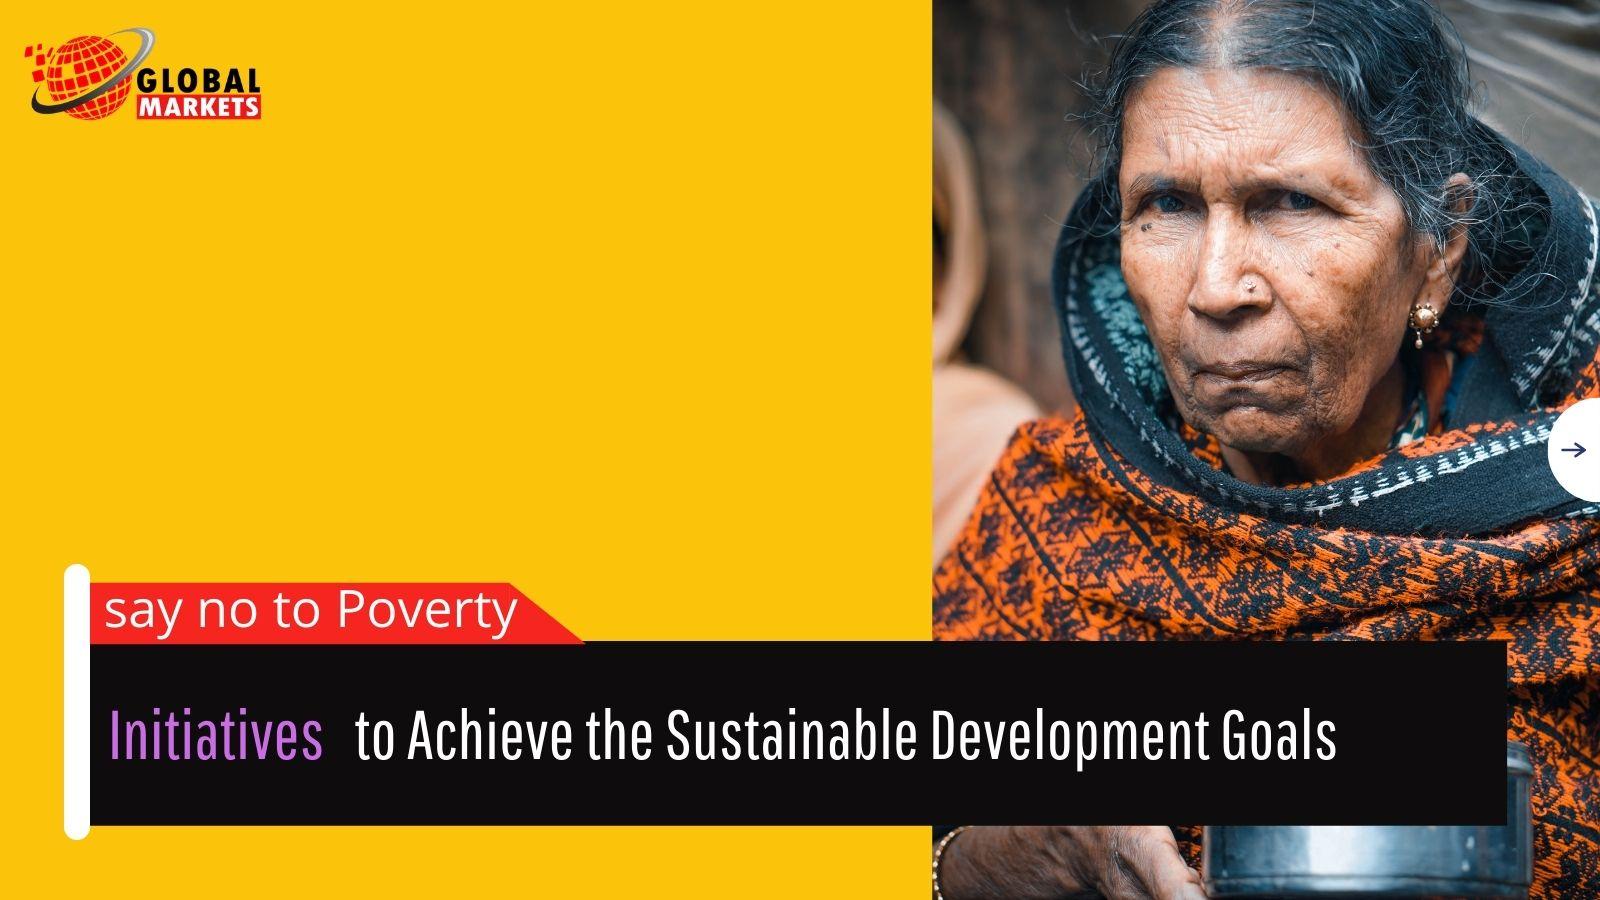 Advanced improvement sustainable development